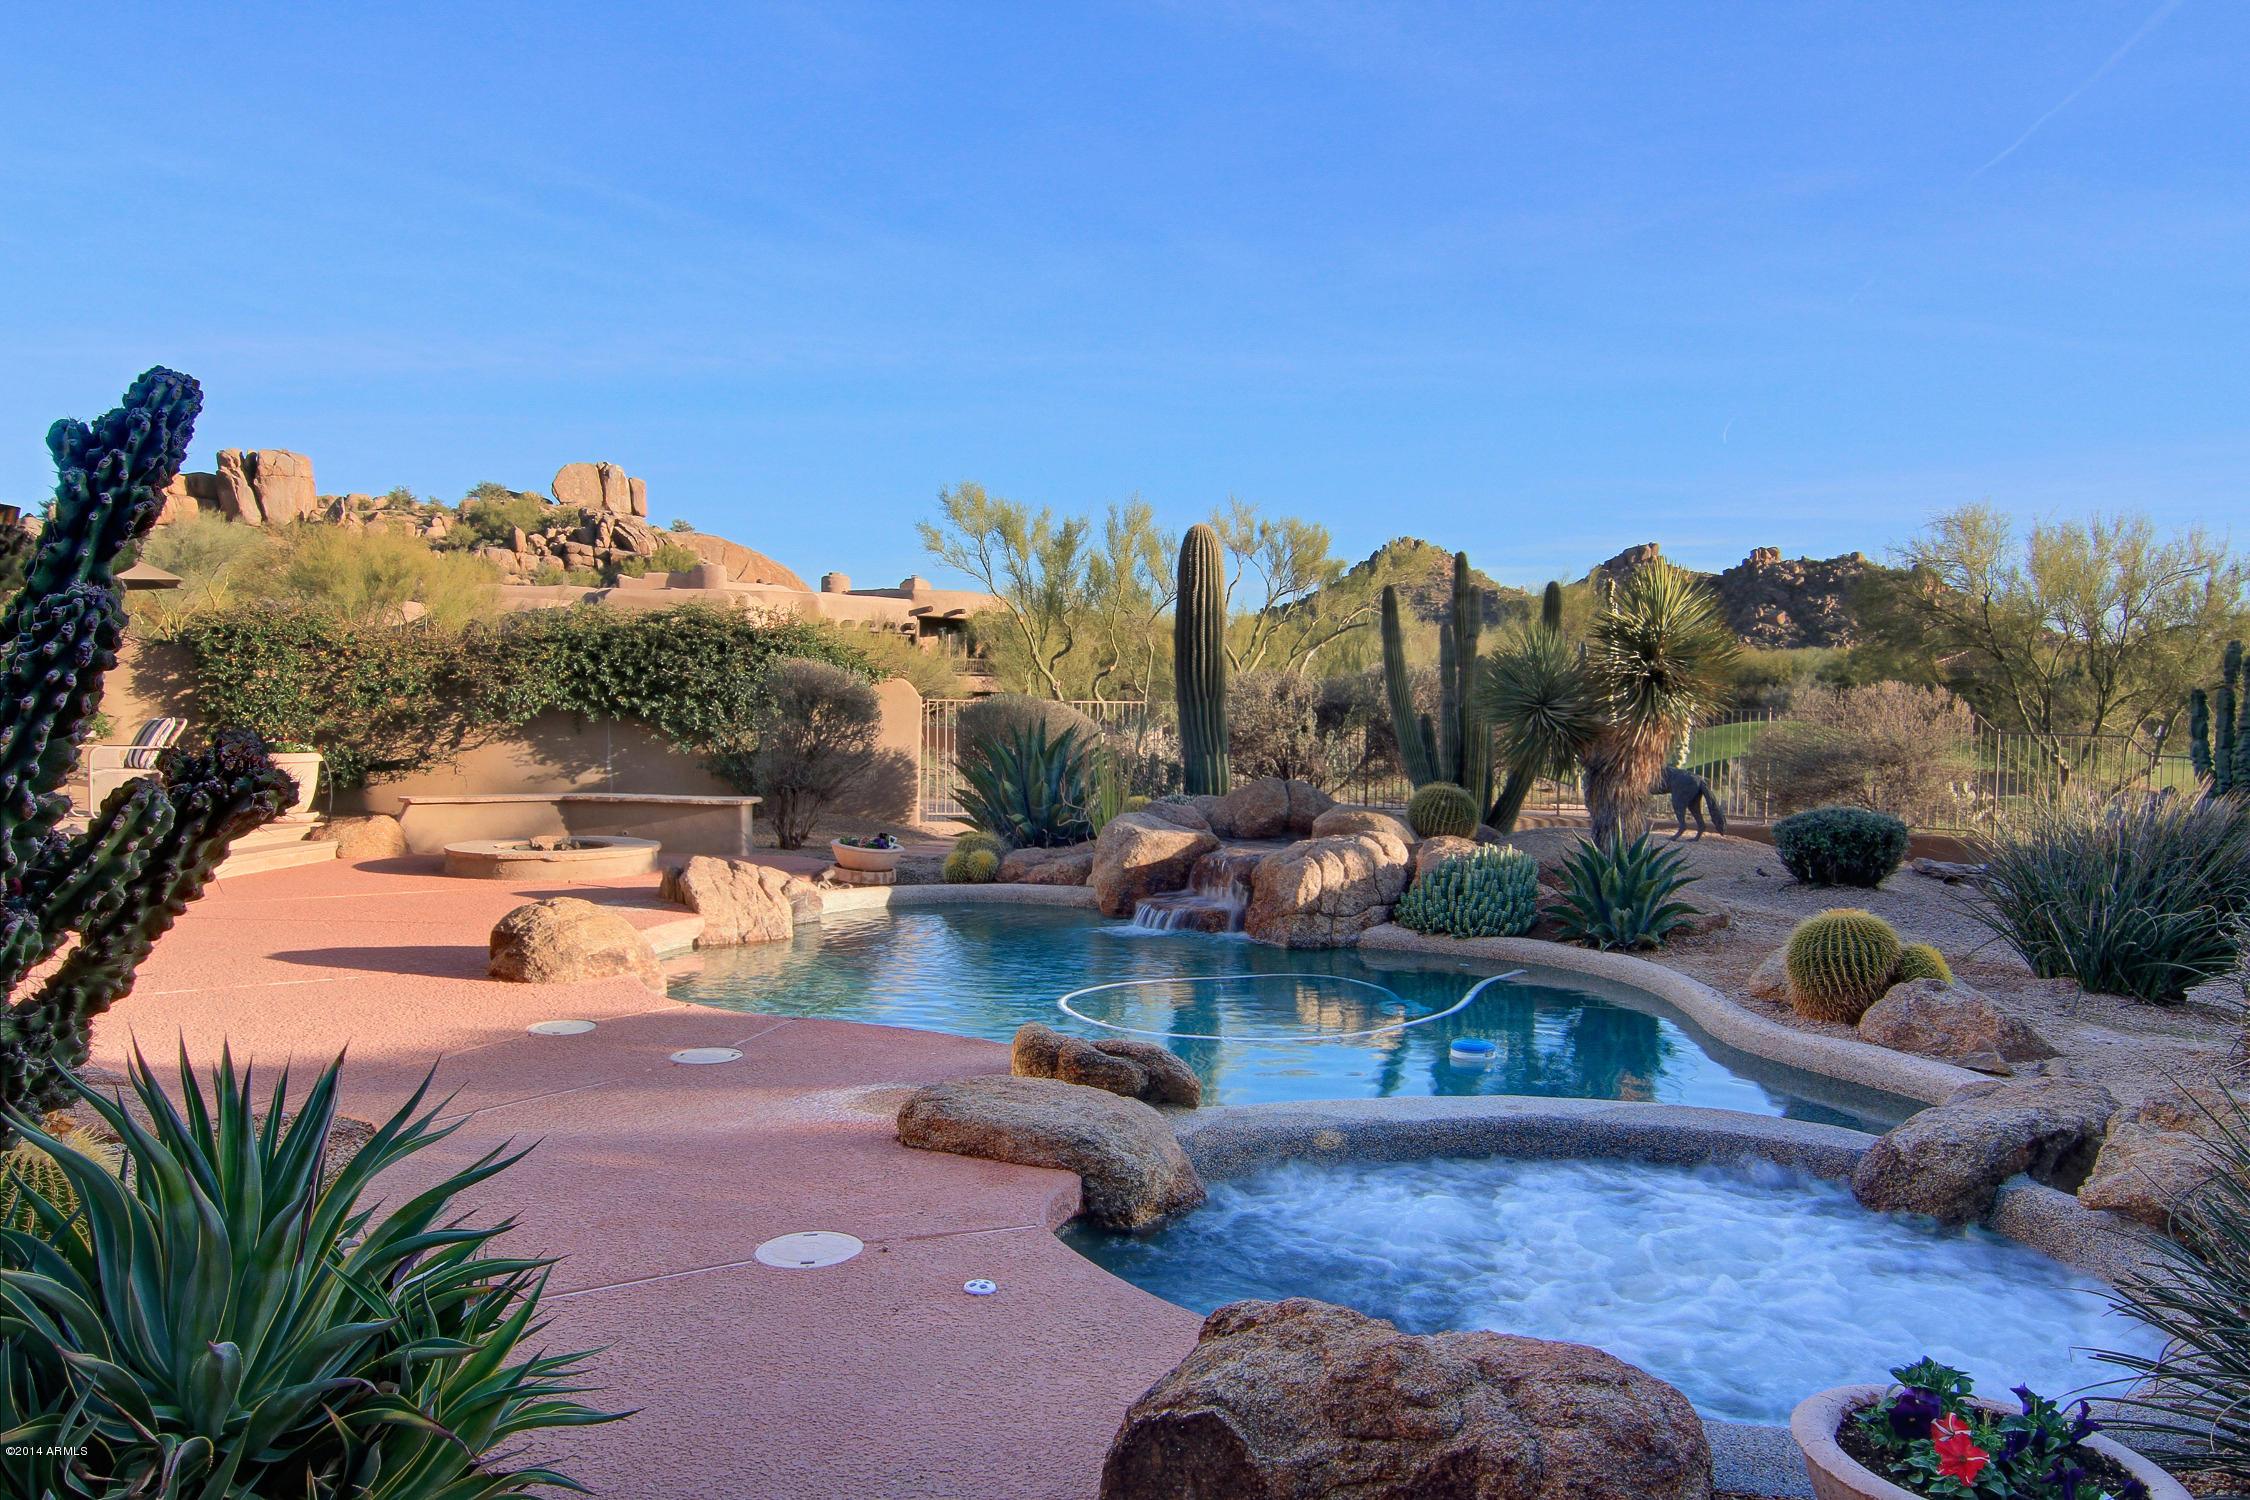 7485 E Tumbleweed Drive, Scottsdale AZ 85266 - Photo 1